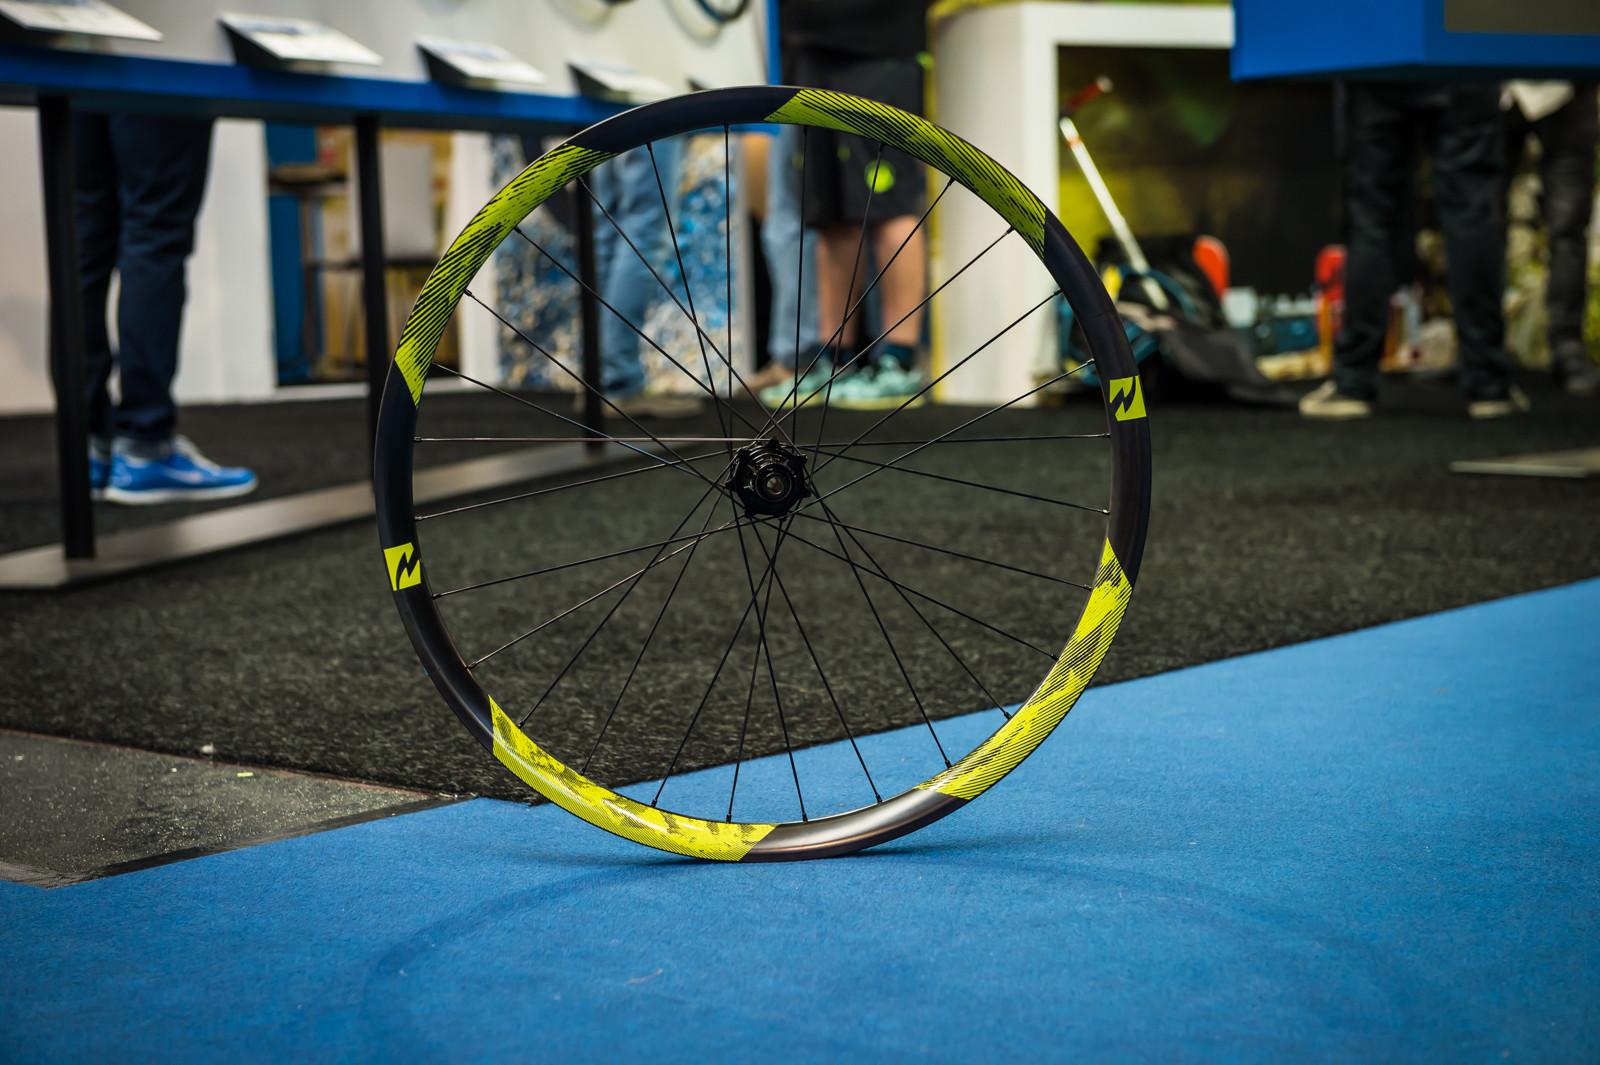 Reynolds Enduro Wheel - 2016 Mountain Bike Components at Eurobike - Mountain Biking Pictures - Vital MTB